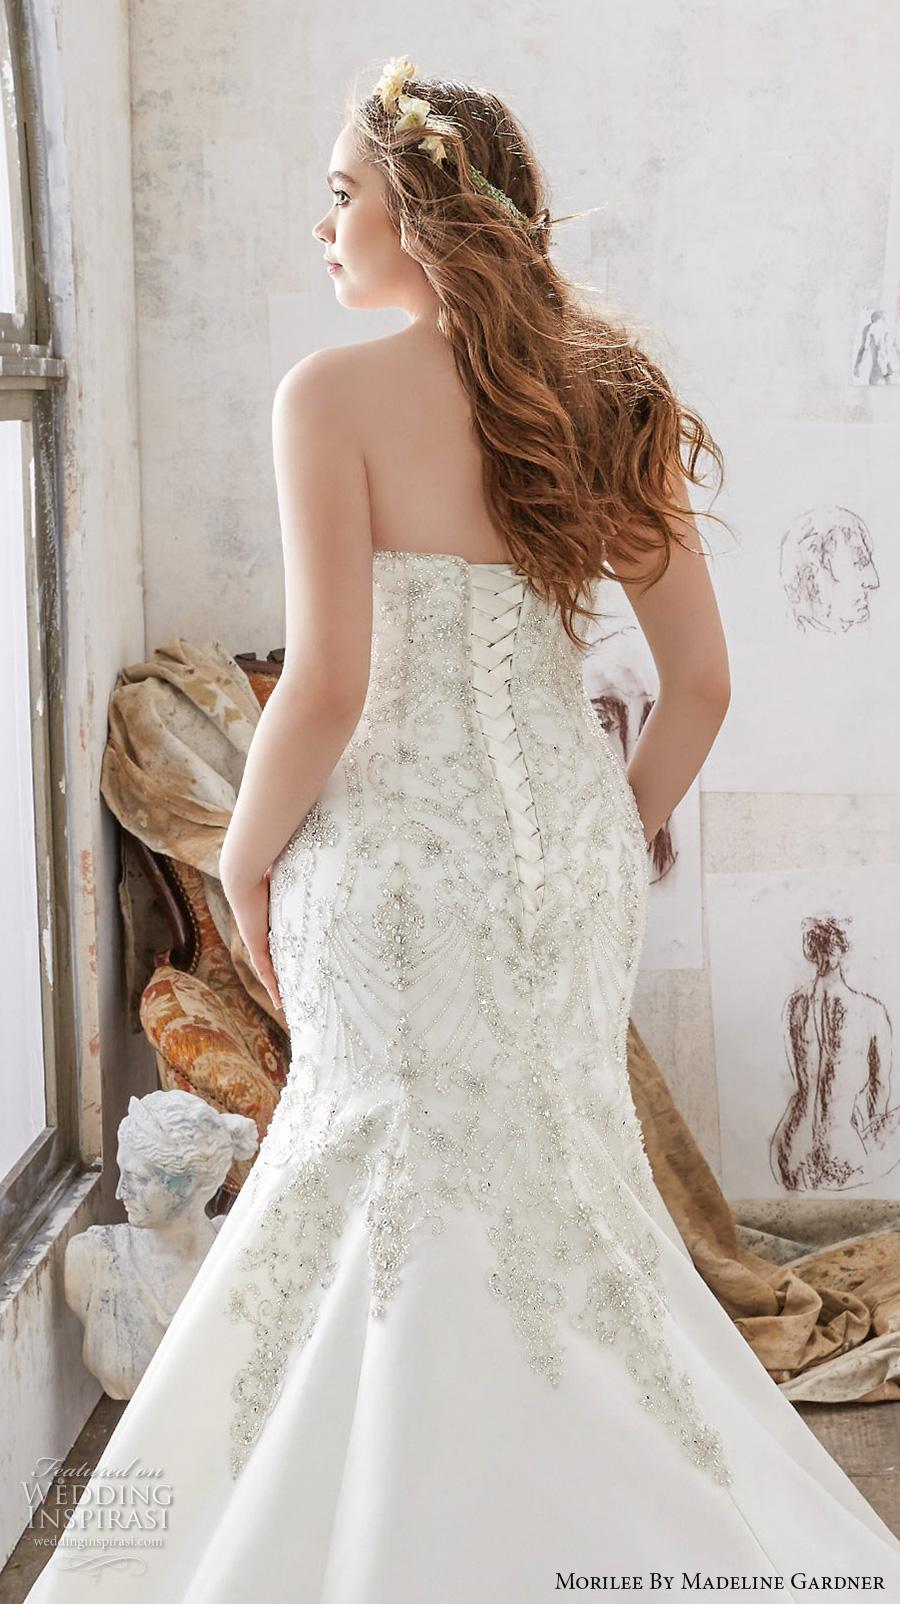 Morilee by madeline gardner spring 2017 wedding dresses for Fitted wedding dresses for plus size